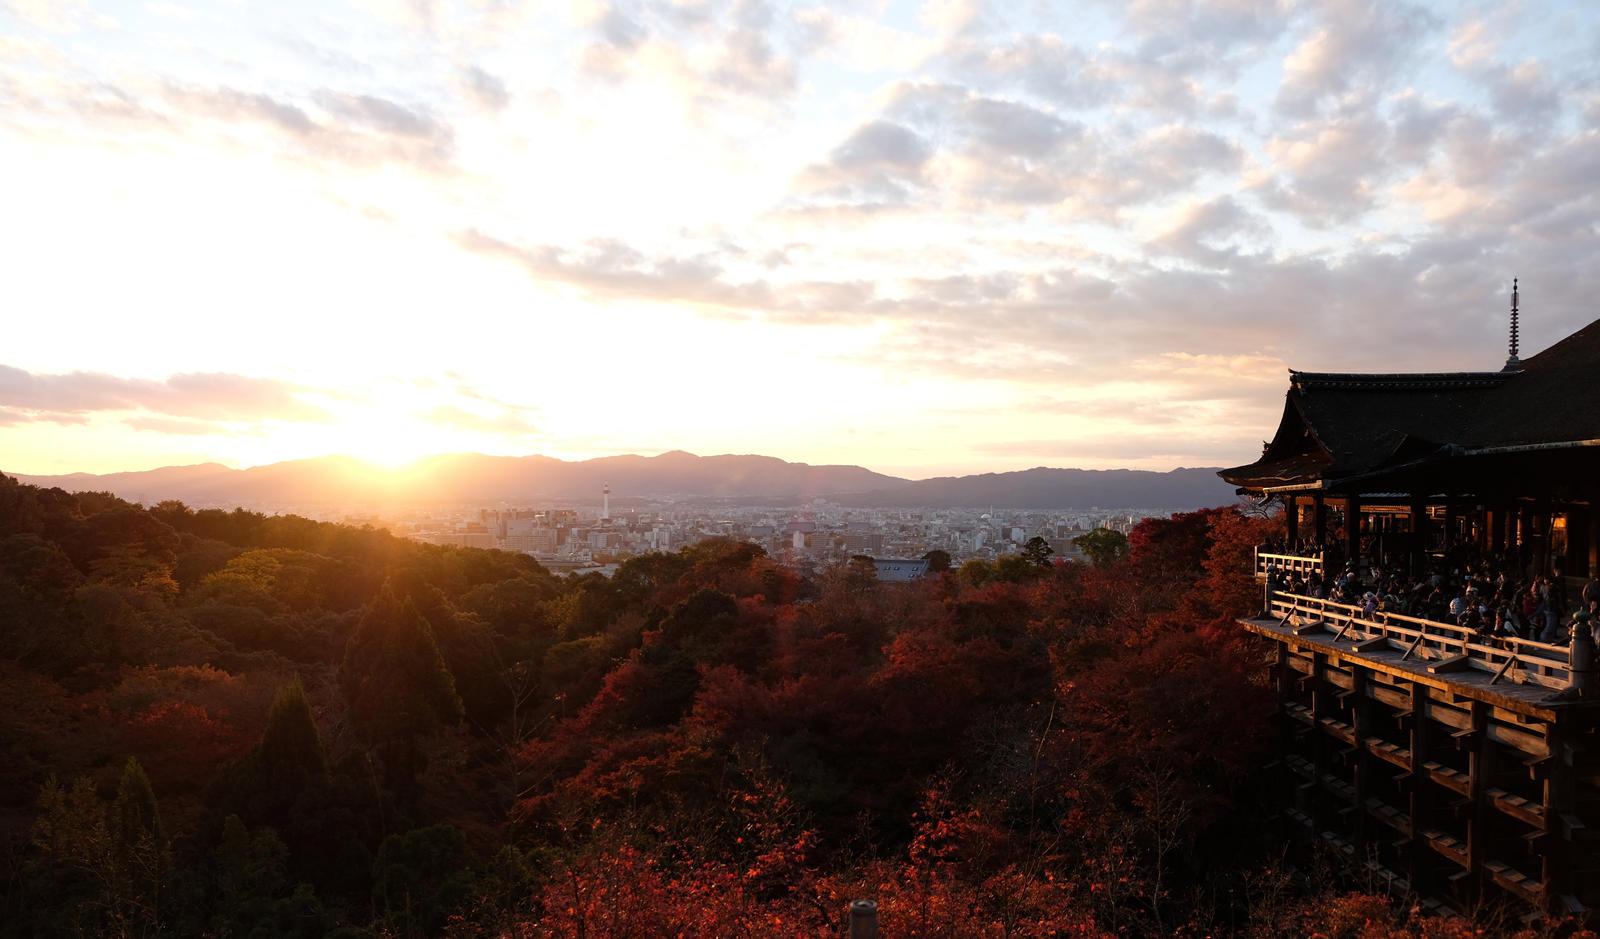 Kiyomizu-dera by the3dman